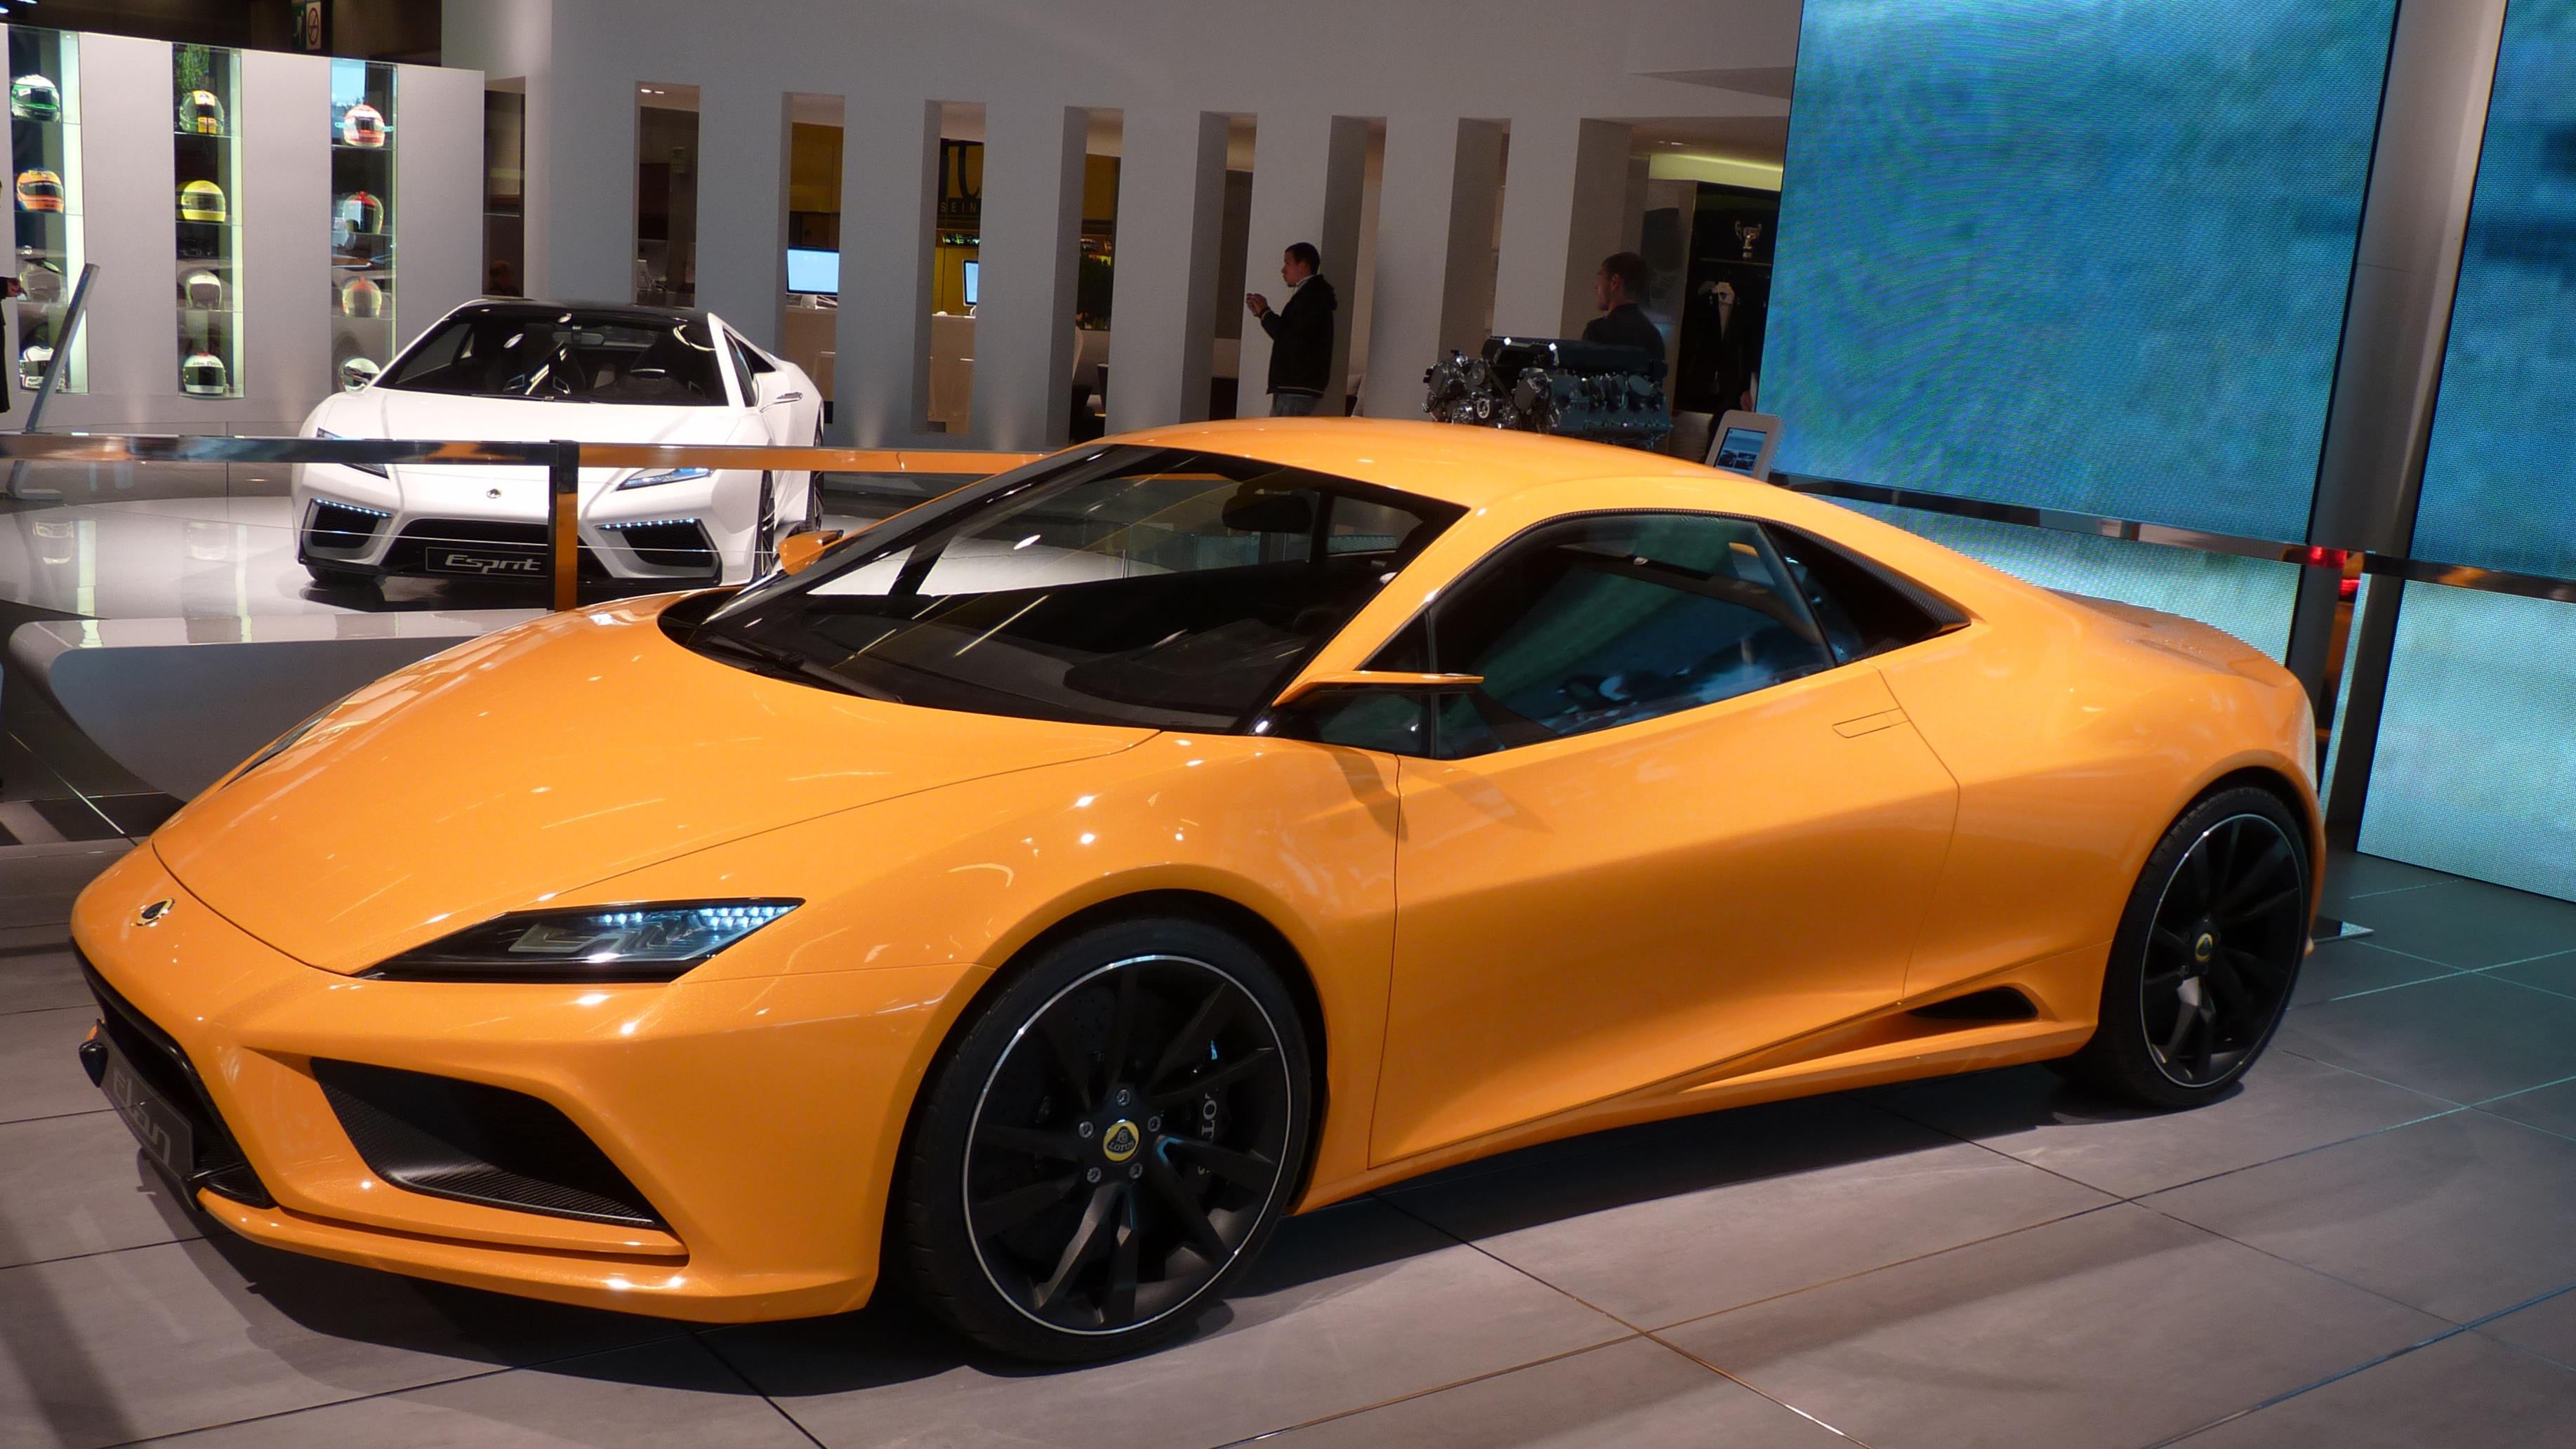 file 2010 lotus elan 2 mondial de l 39 automobile wikipedia. Black Bedroom Furniture Sets. Home Design Ideas